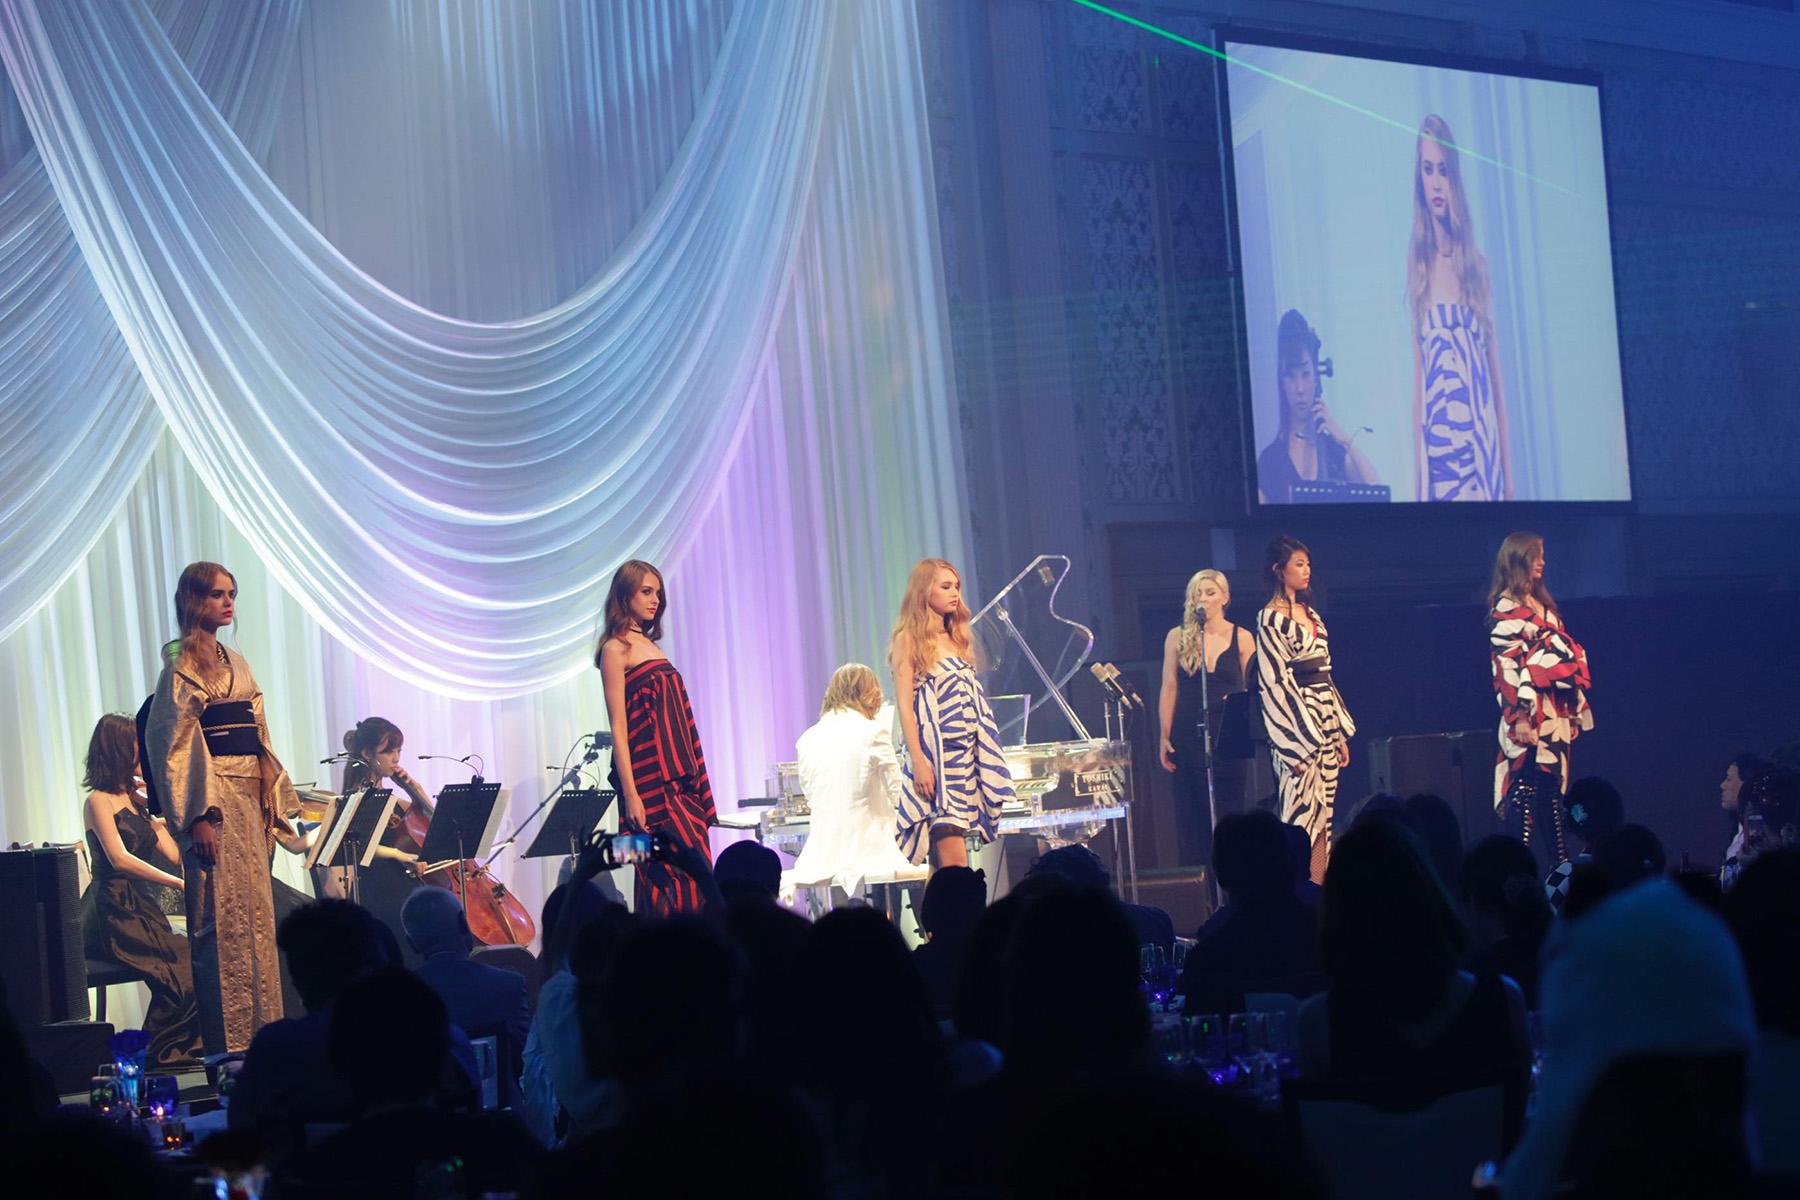 RMMS-Yoshiki-Dinner-Show-Nagoya-20170826-3194